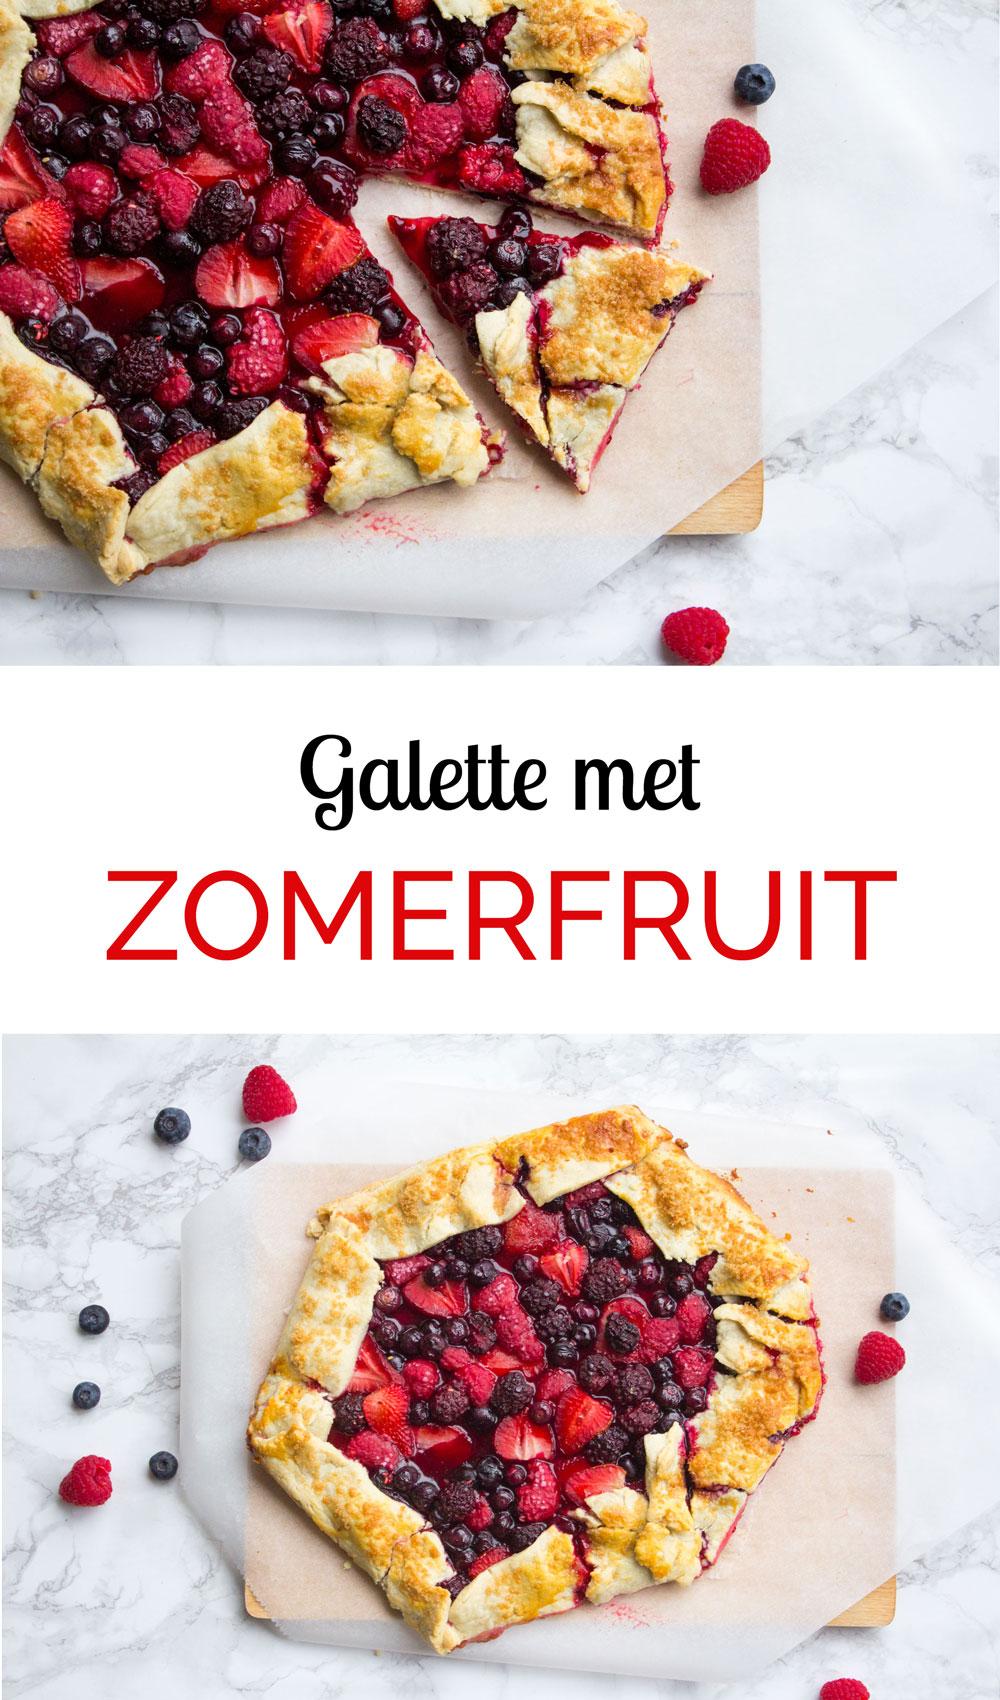 zomerfruit galette